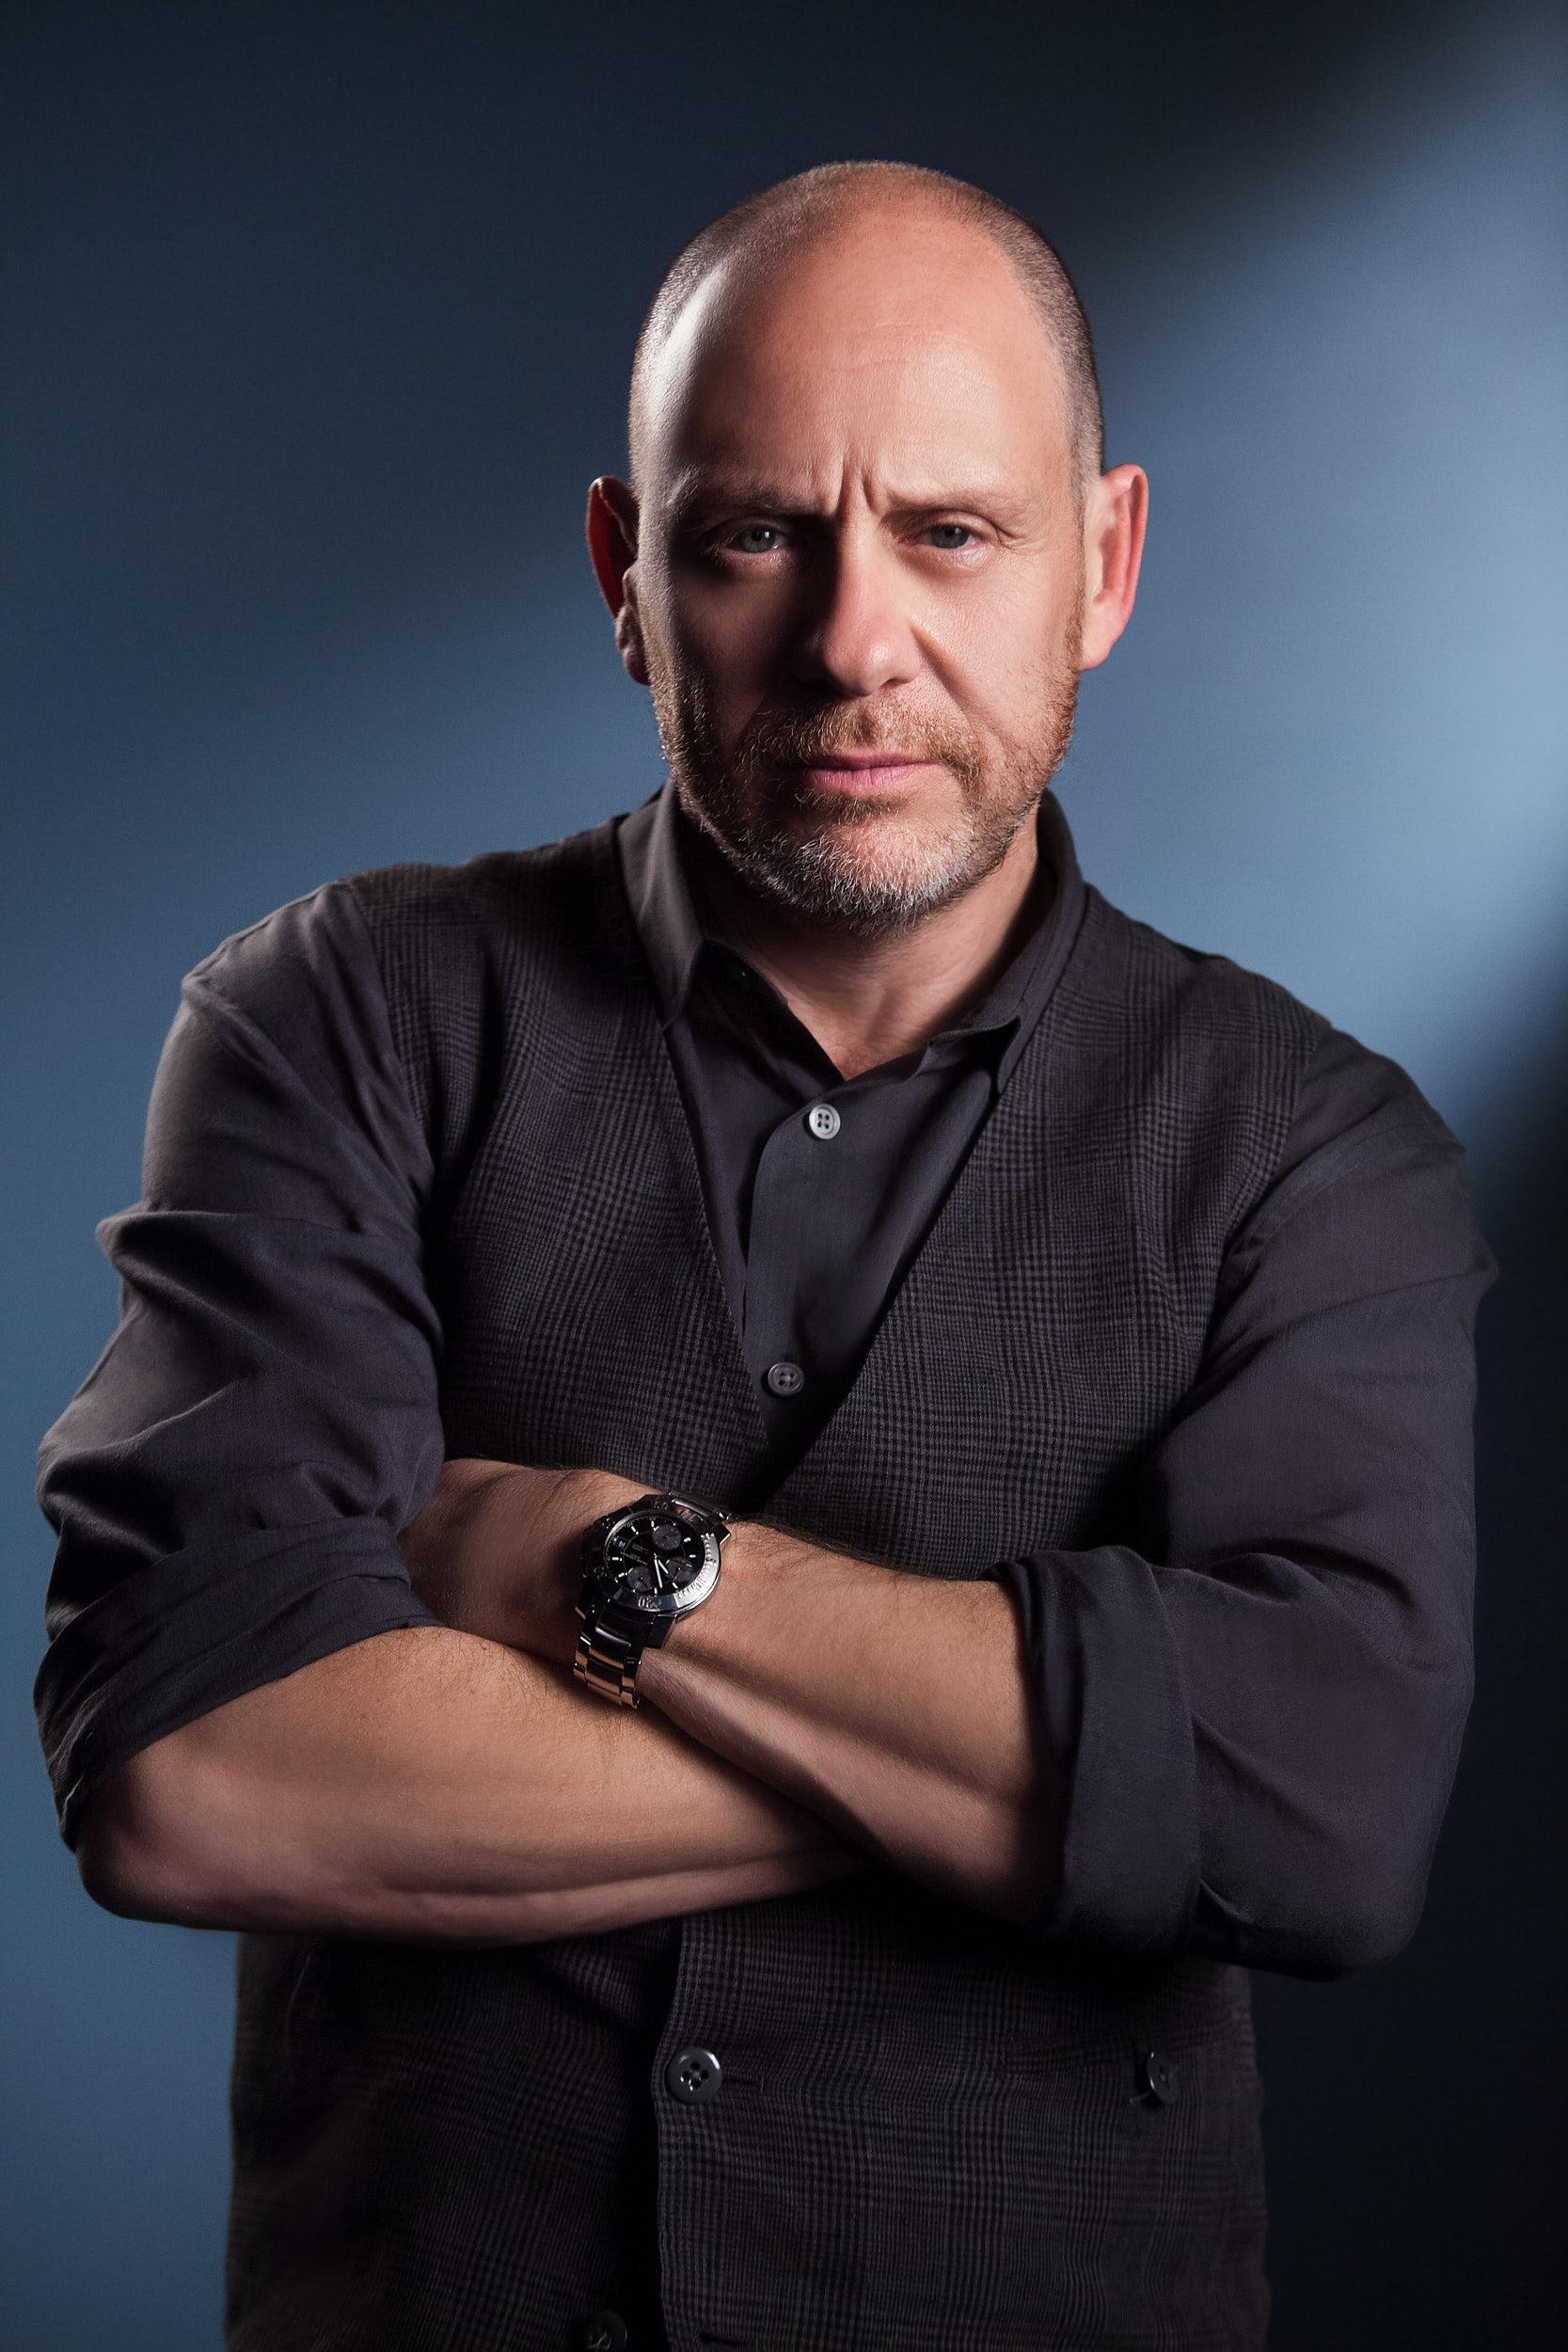 Producer/Director Daniel Sakheim